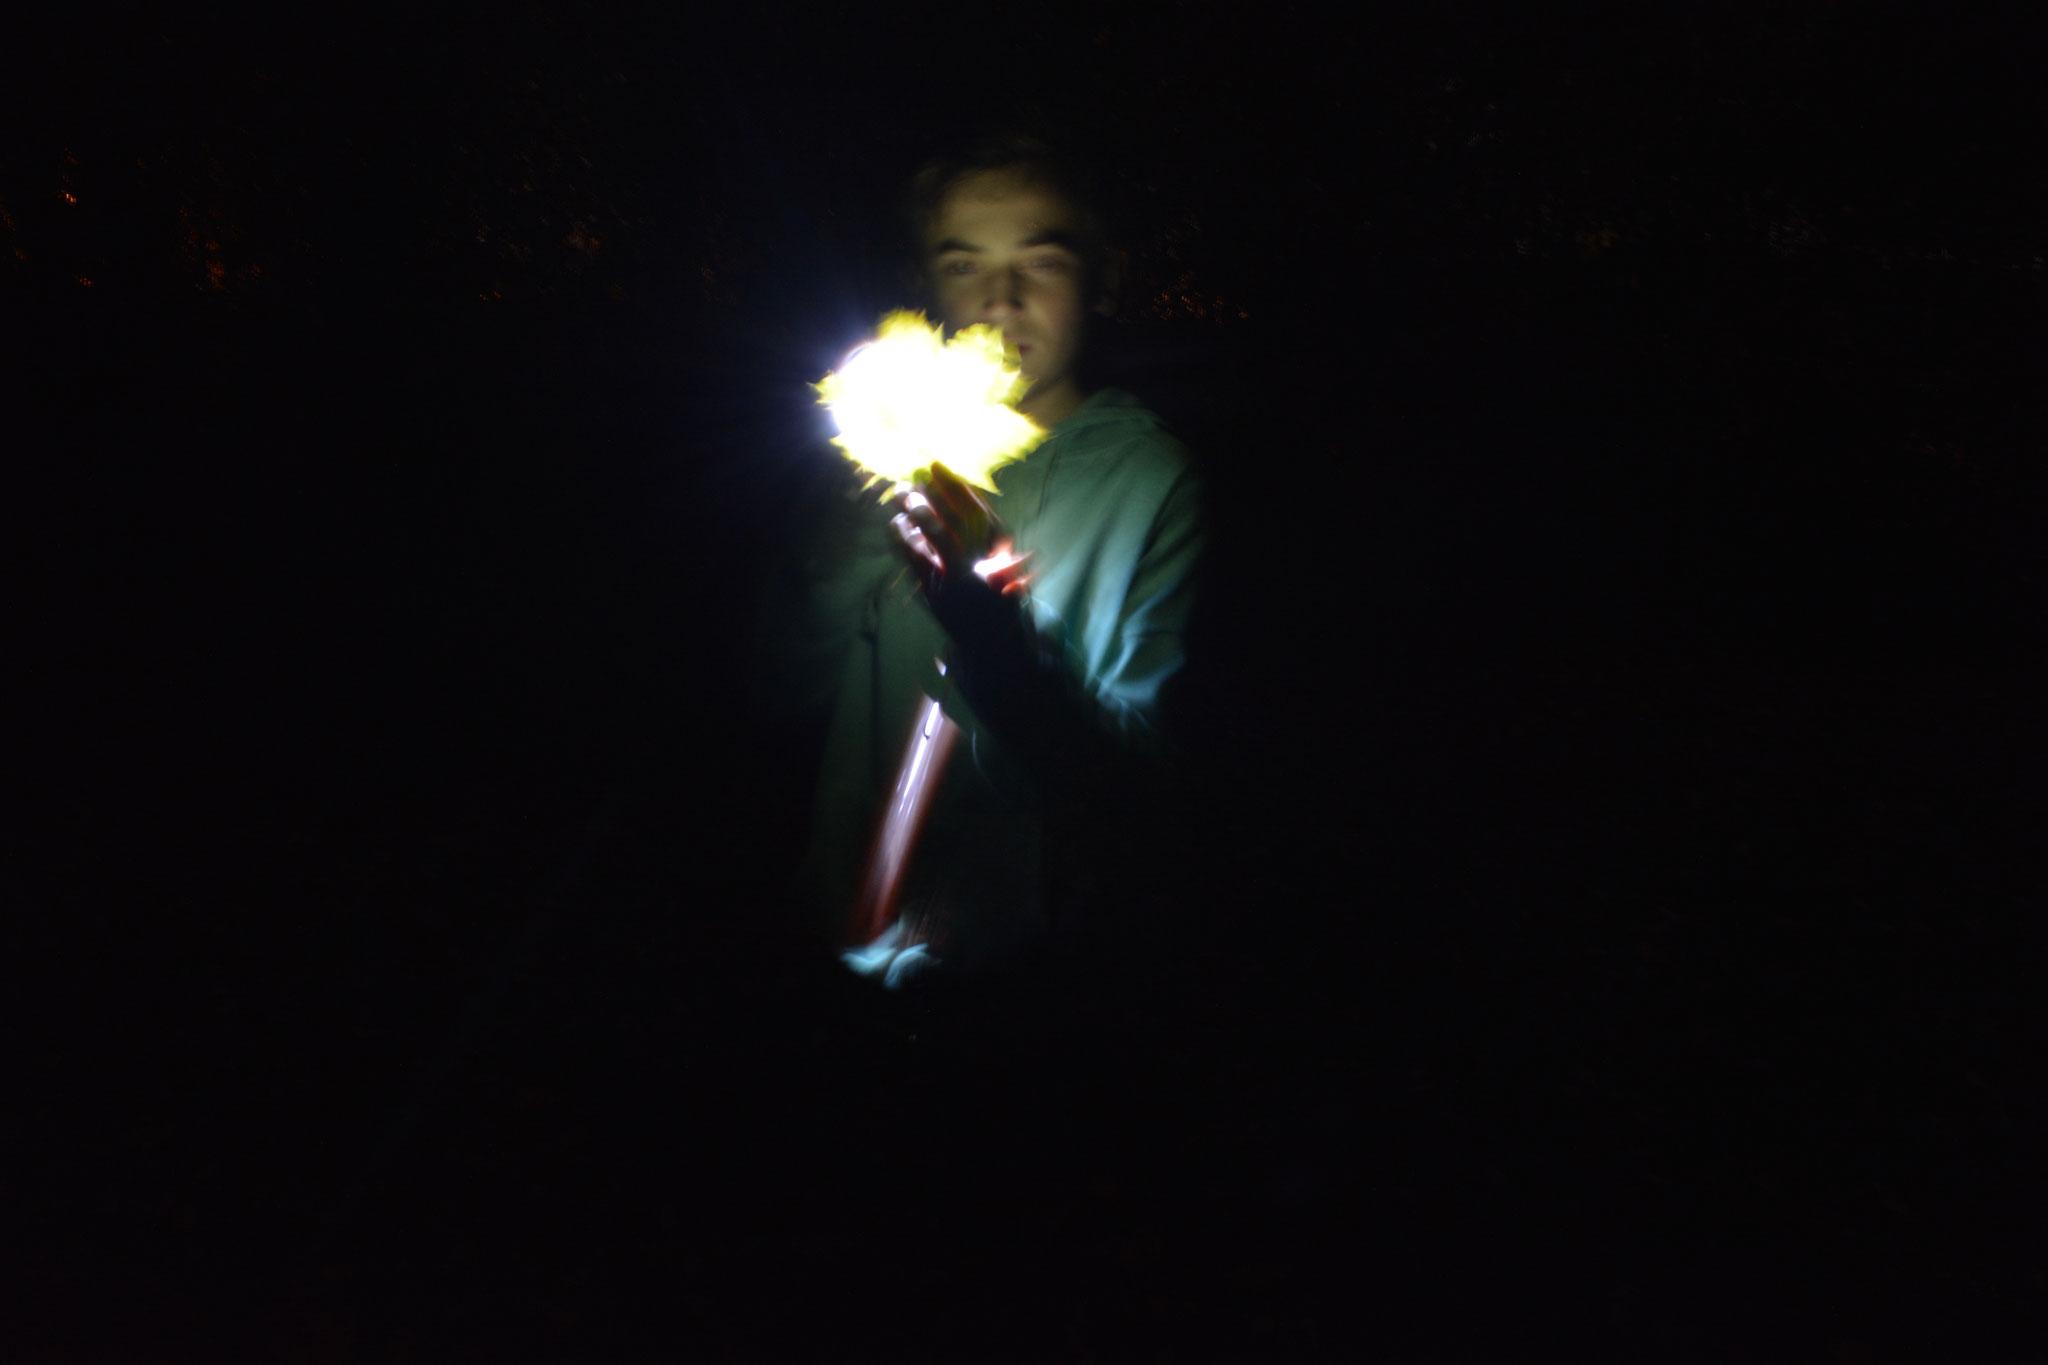 Move@Media: Light Painting